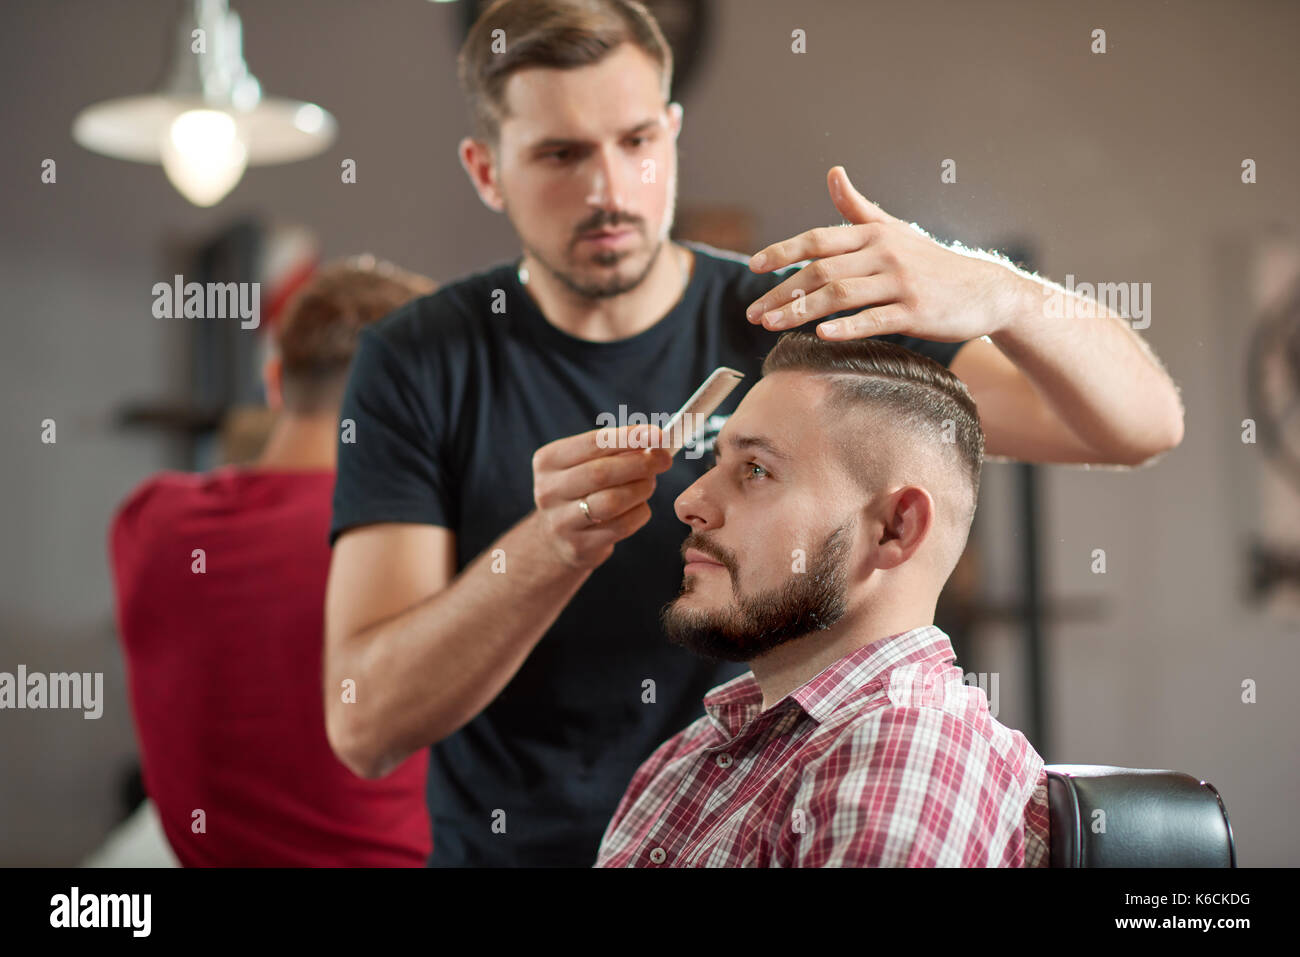 Joven en el barbershop Foto de stock